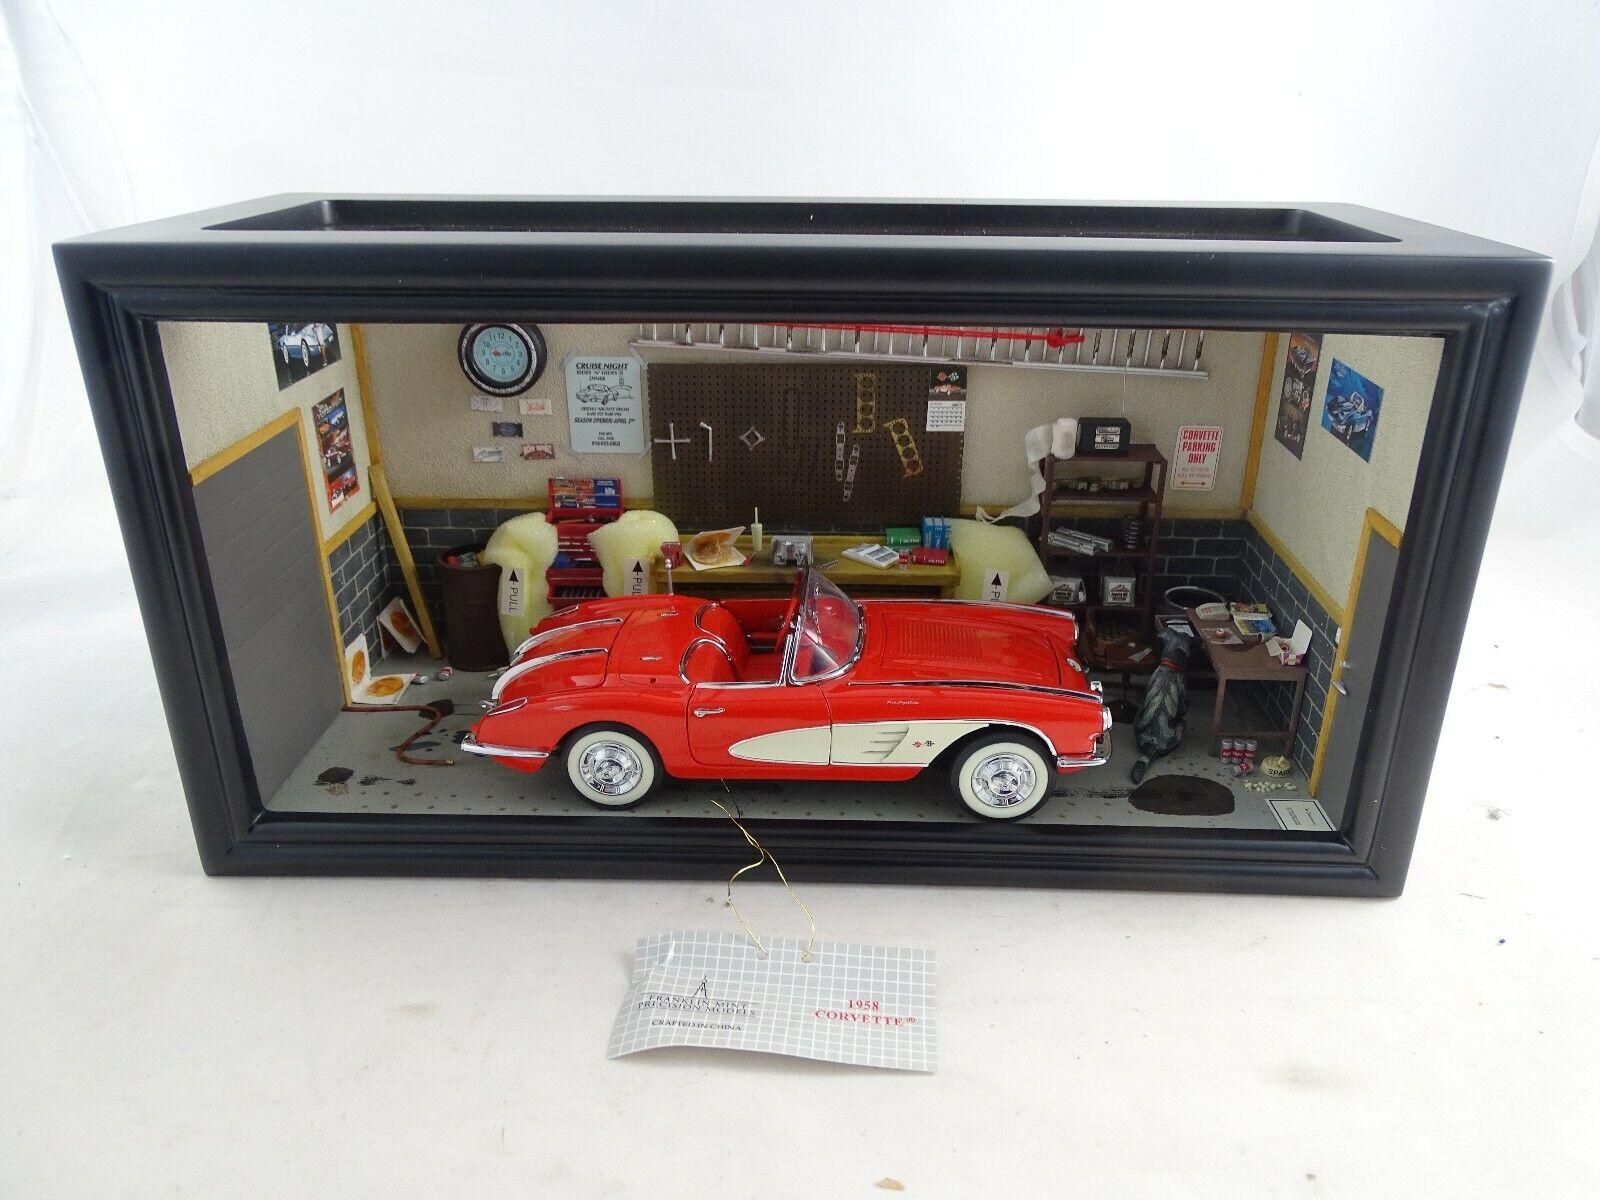 1 24 Franklin Mint Corvette Die Garage Diorama  1958 Rarità in Confezione